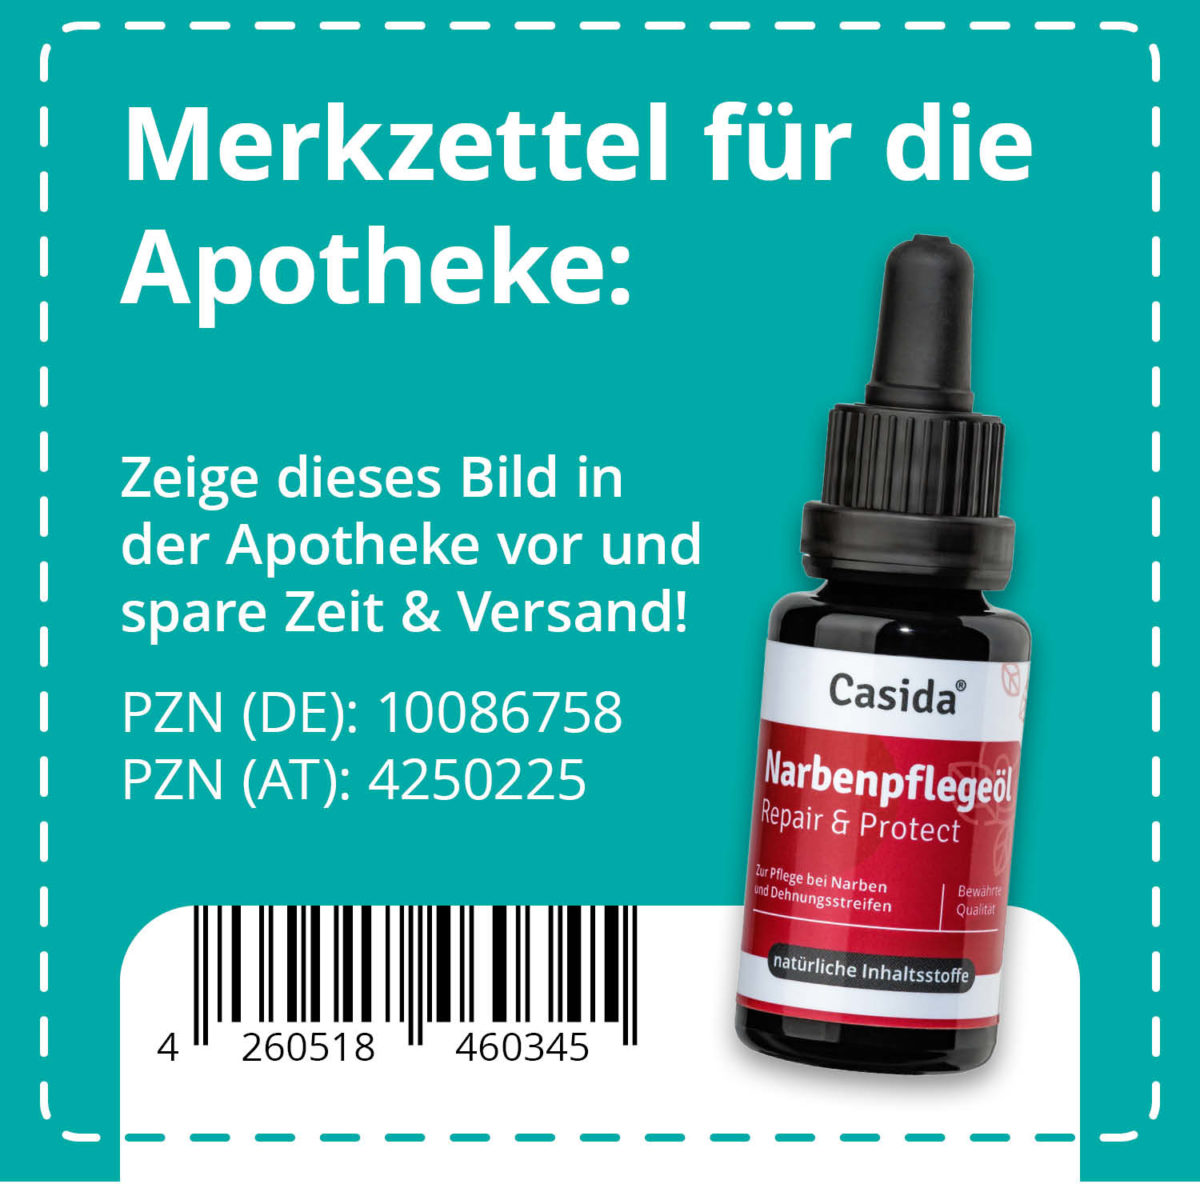 Casida Narbenpflegeöl Repair & Protect – 20 ml 10086758 PZN Apotheke Akne alte Aknenarben behandeln Gesicht Körper pflanzlich (1)9